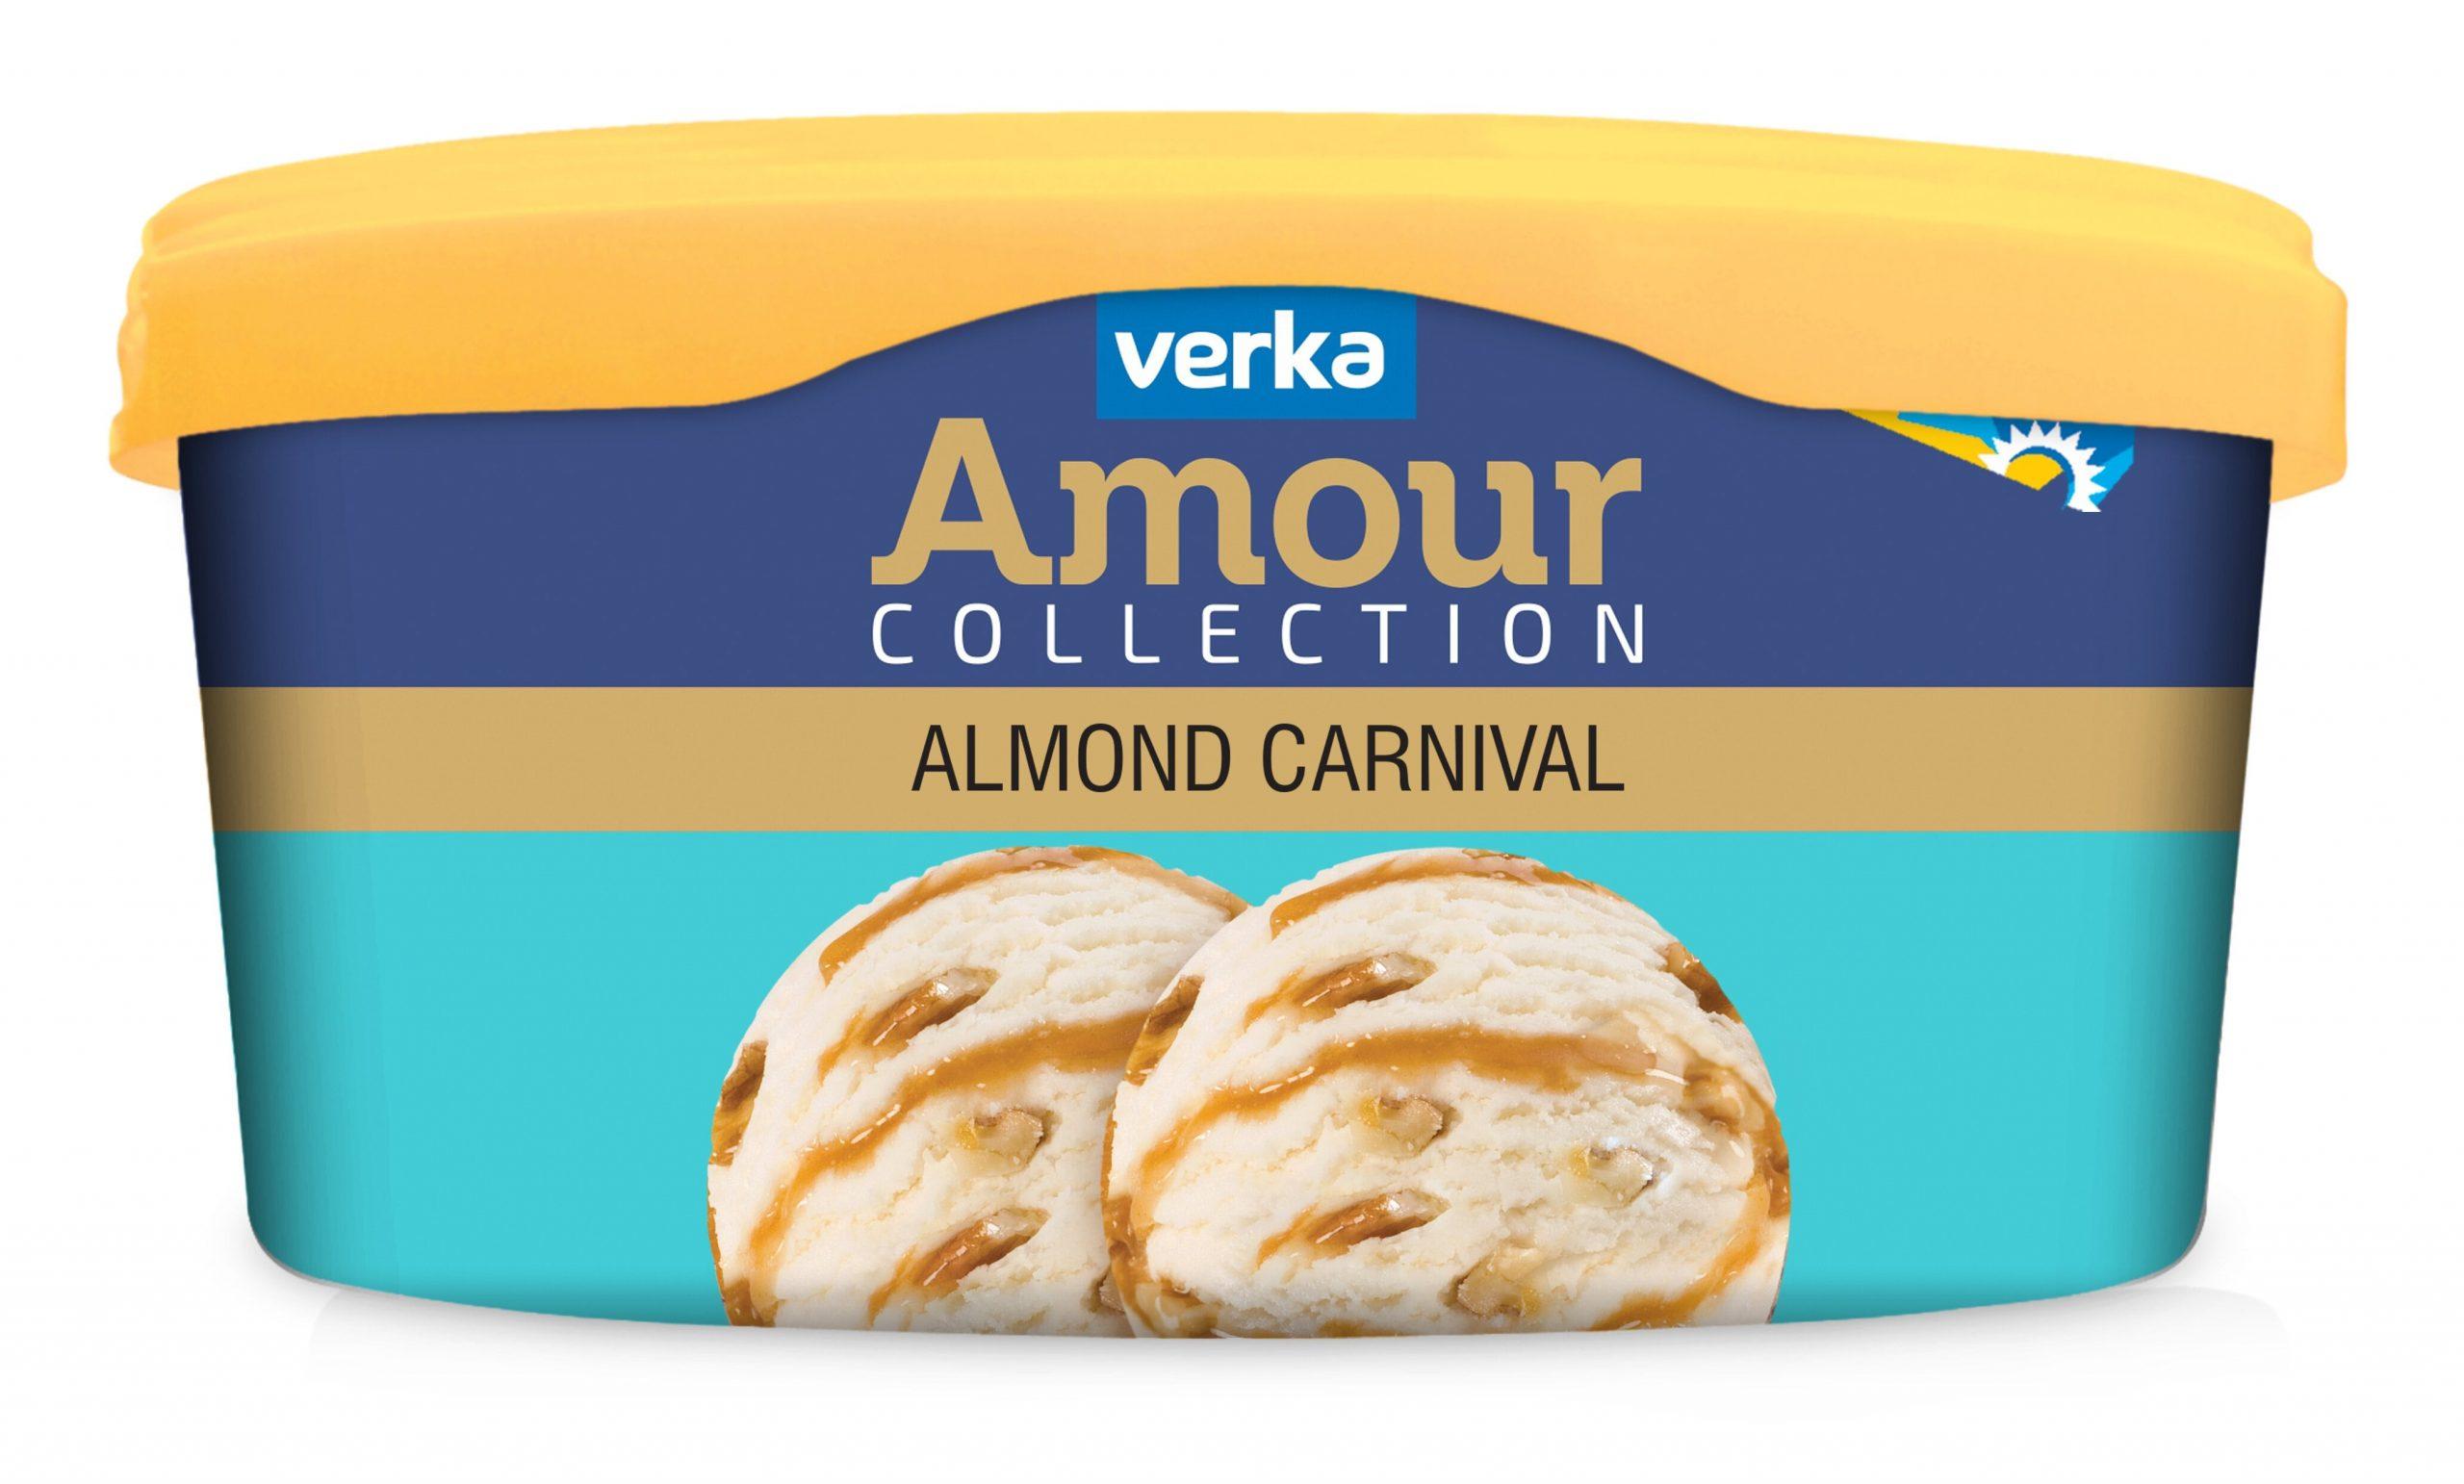 Almond Carnival